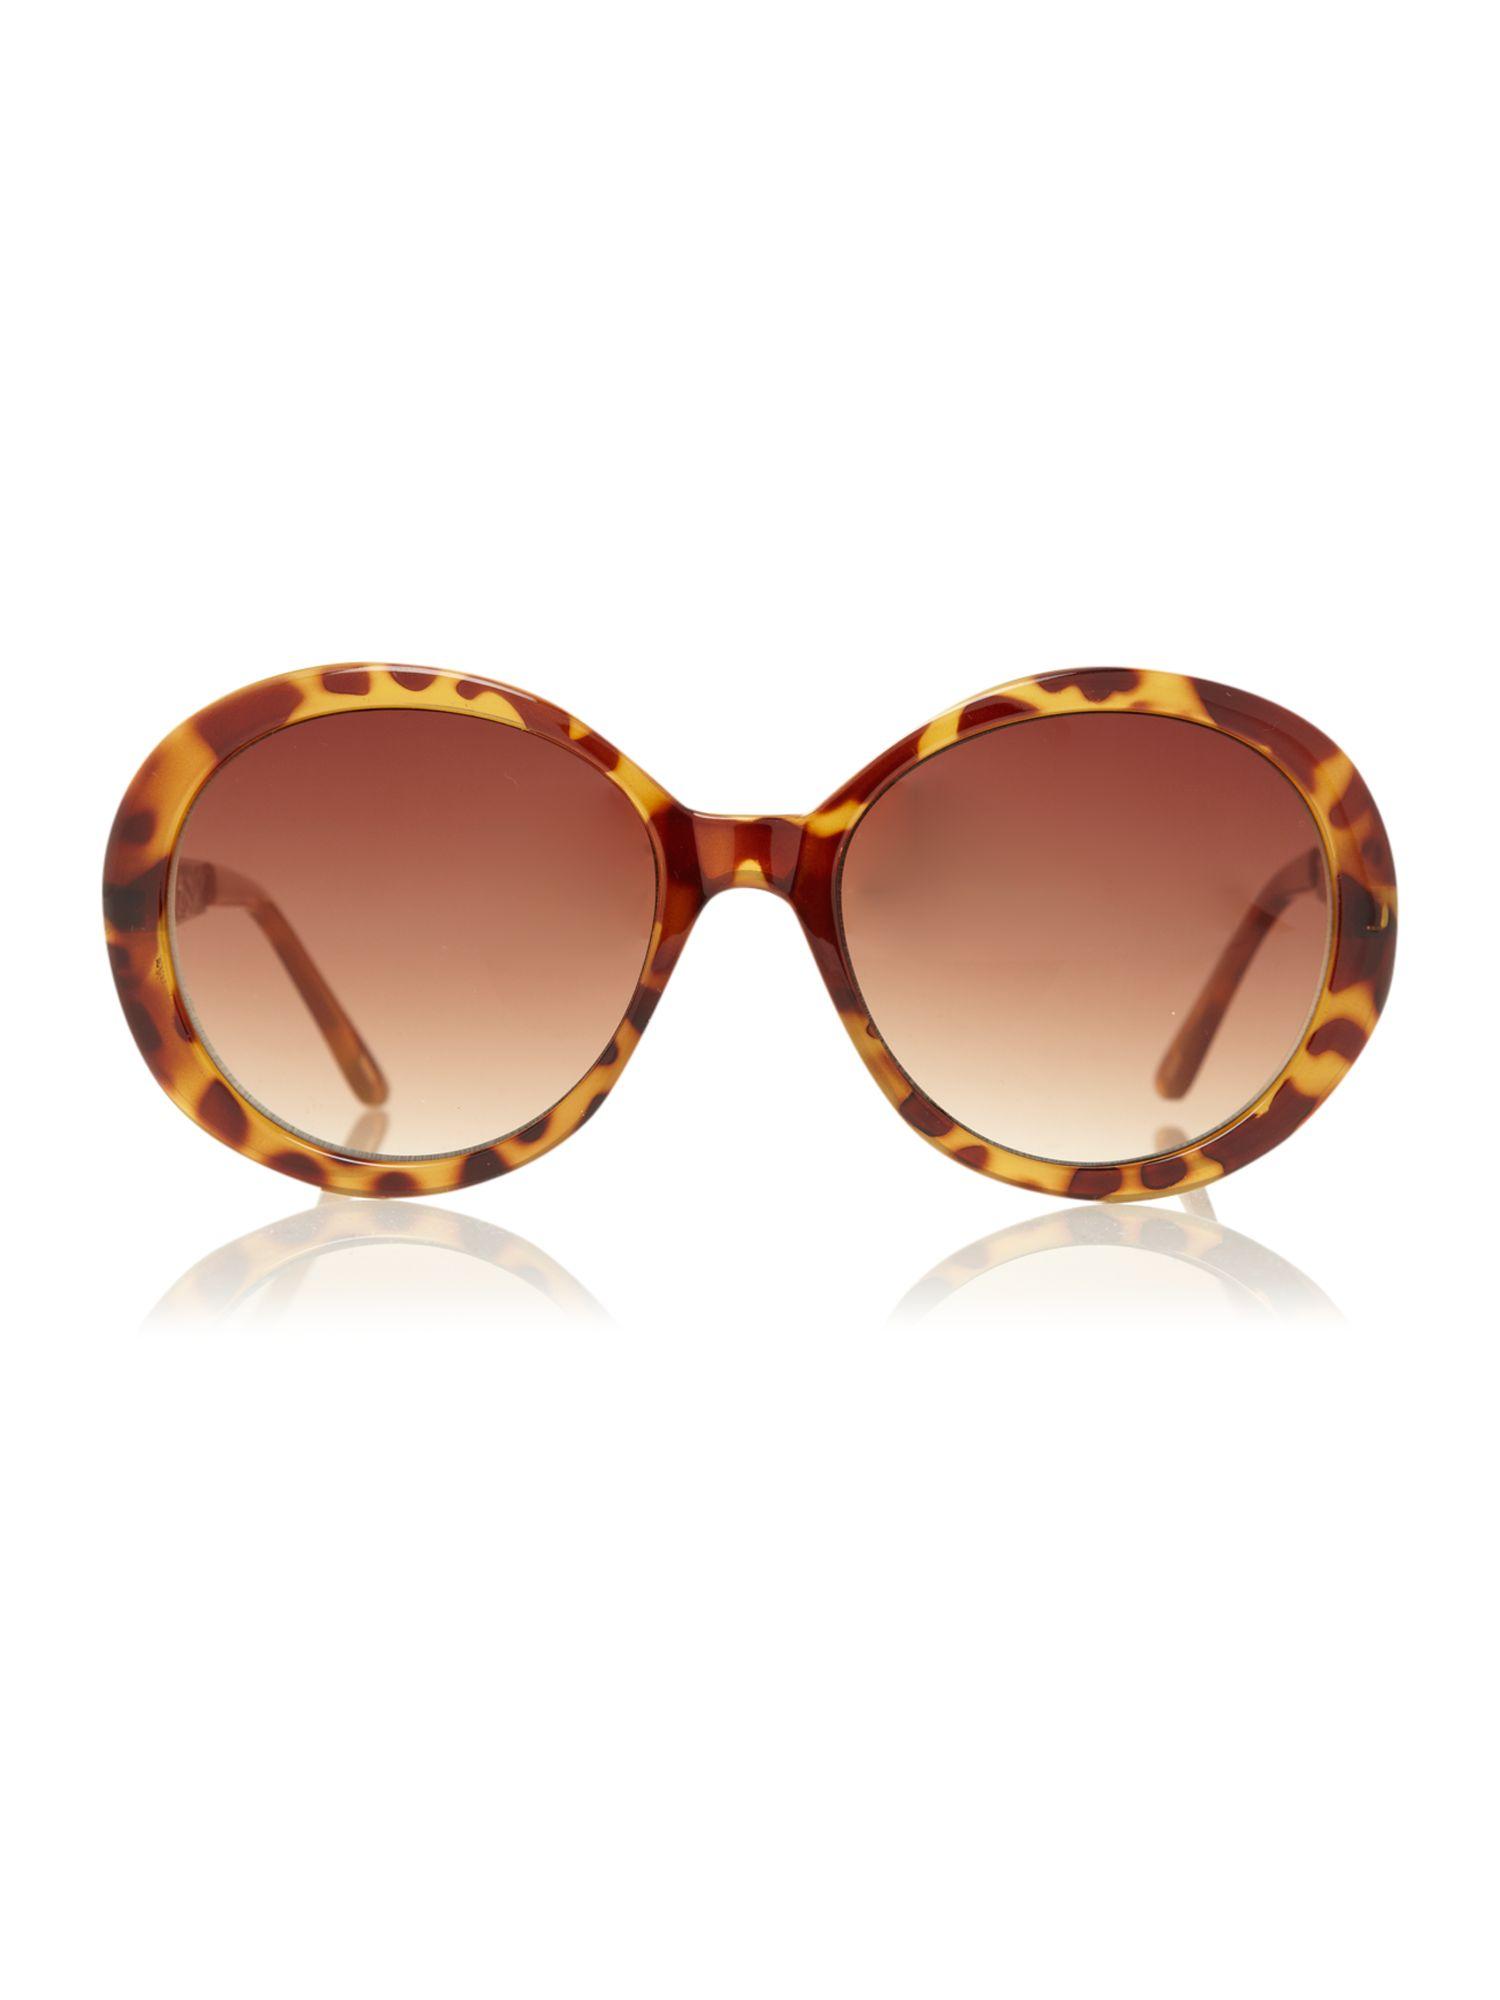 Biba Tortoiseshell Circular Filagree Sunglasses